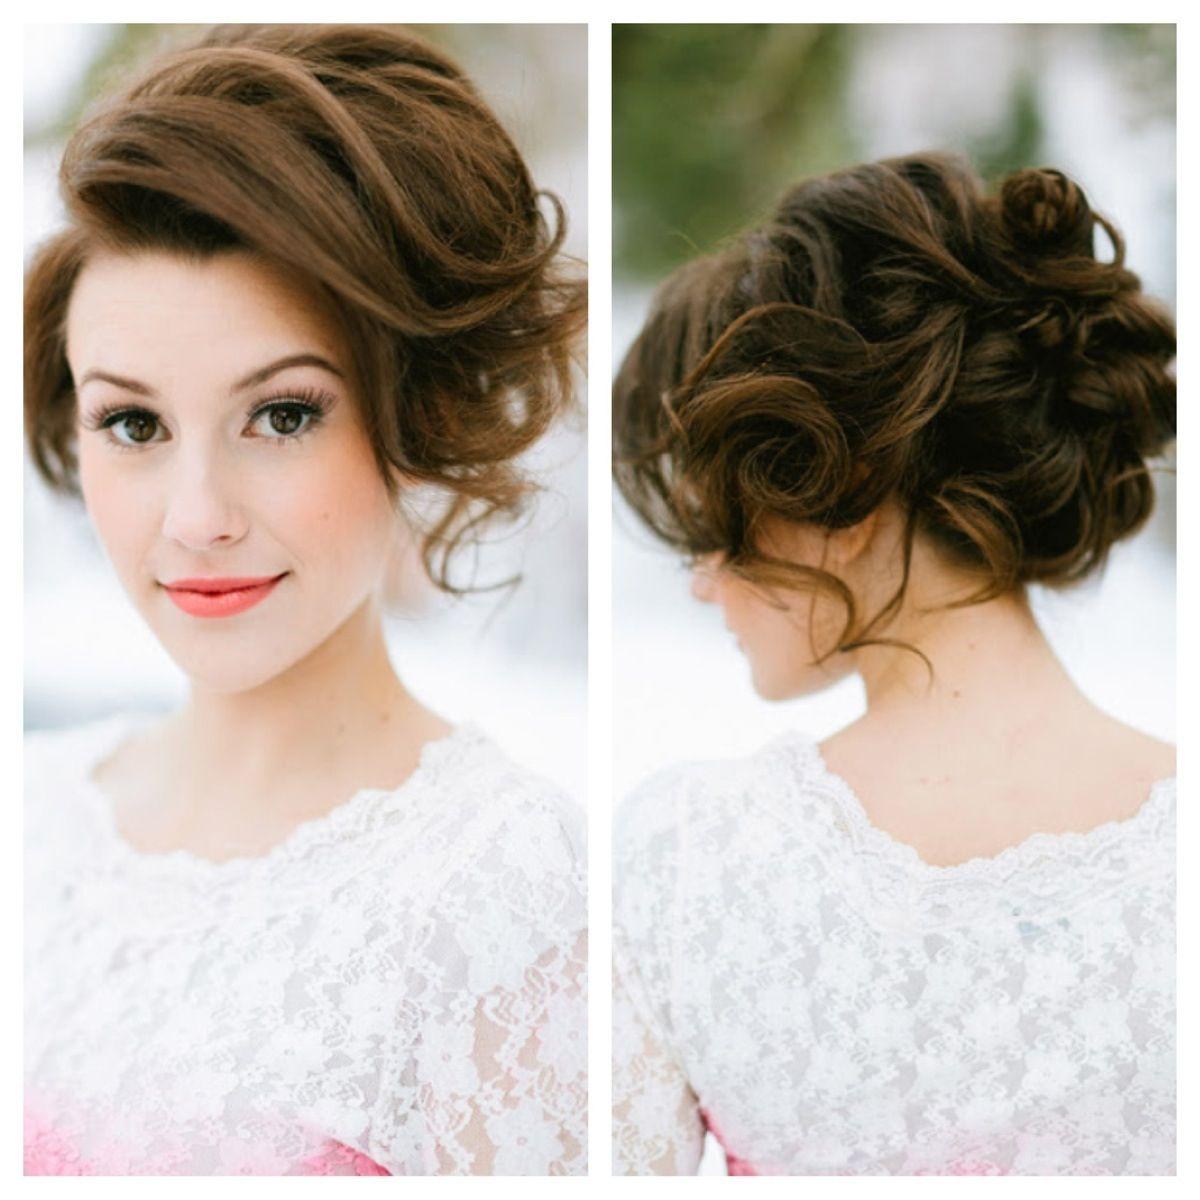 hottest bridesmaid hairstyles for long hair bridesmaid hair